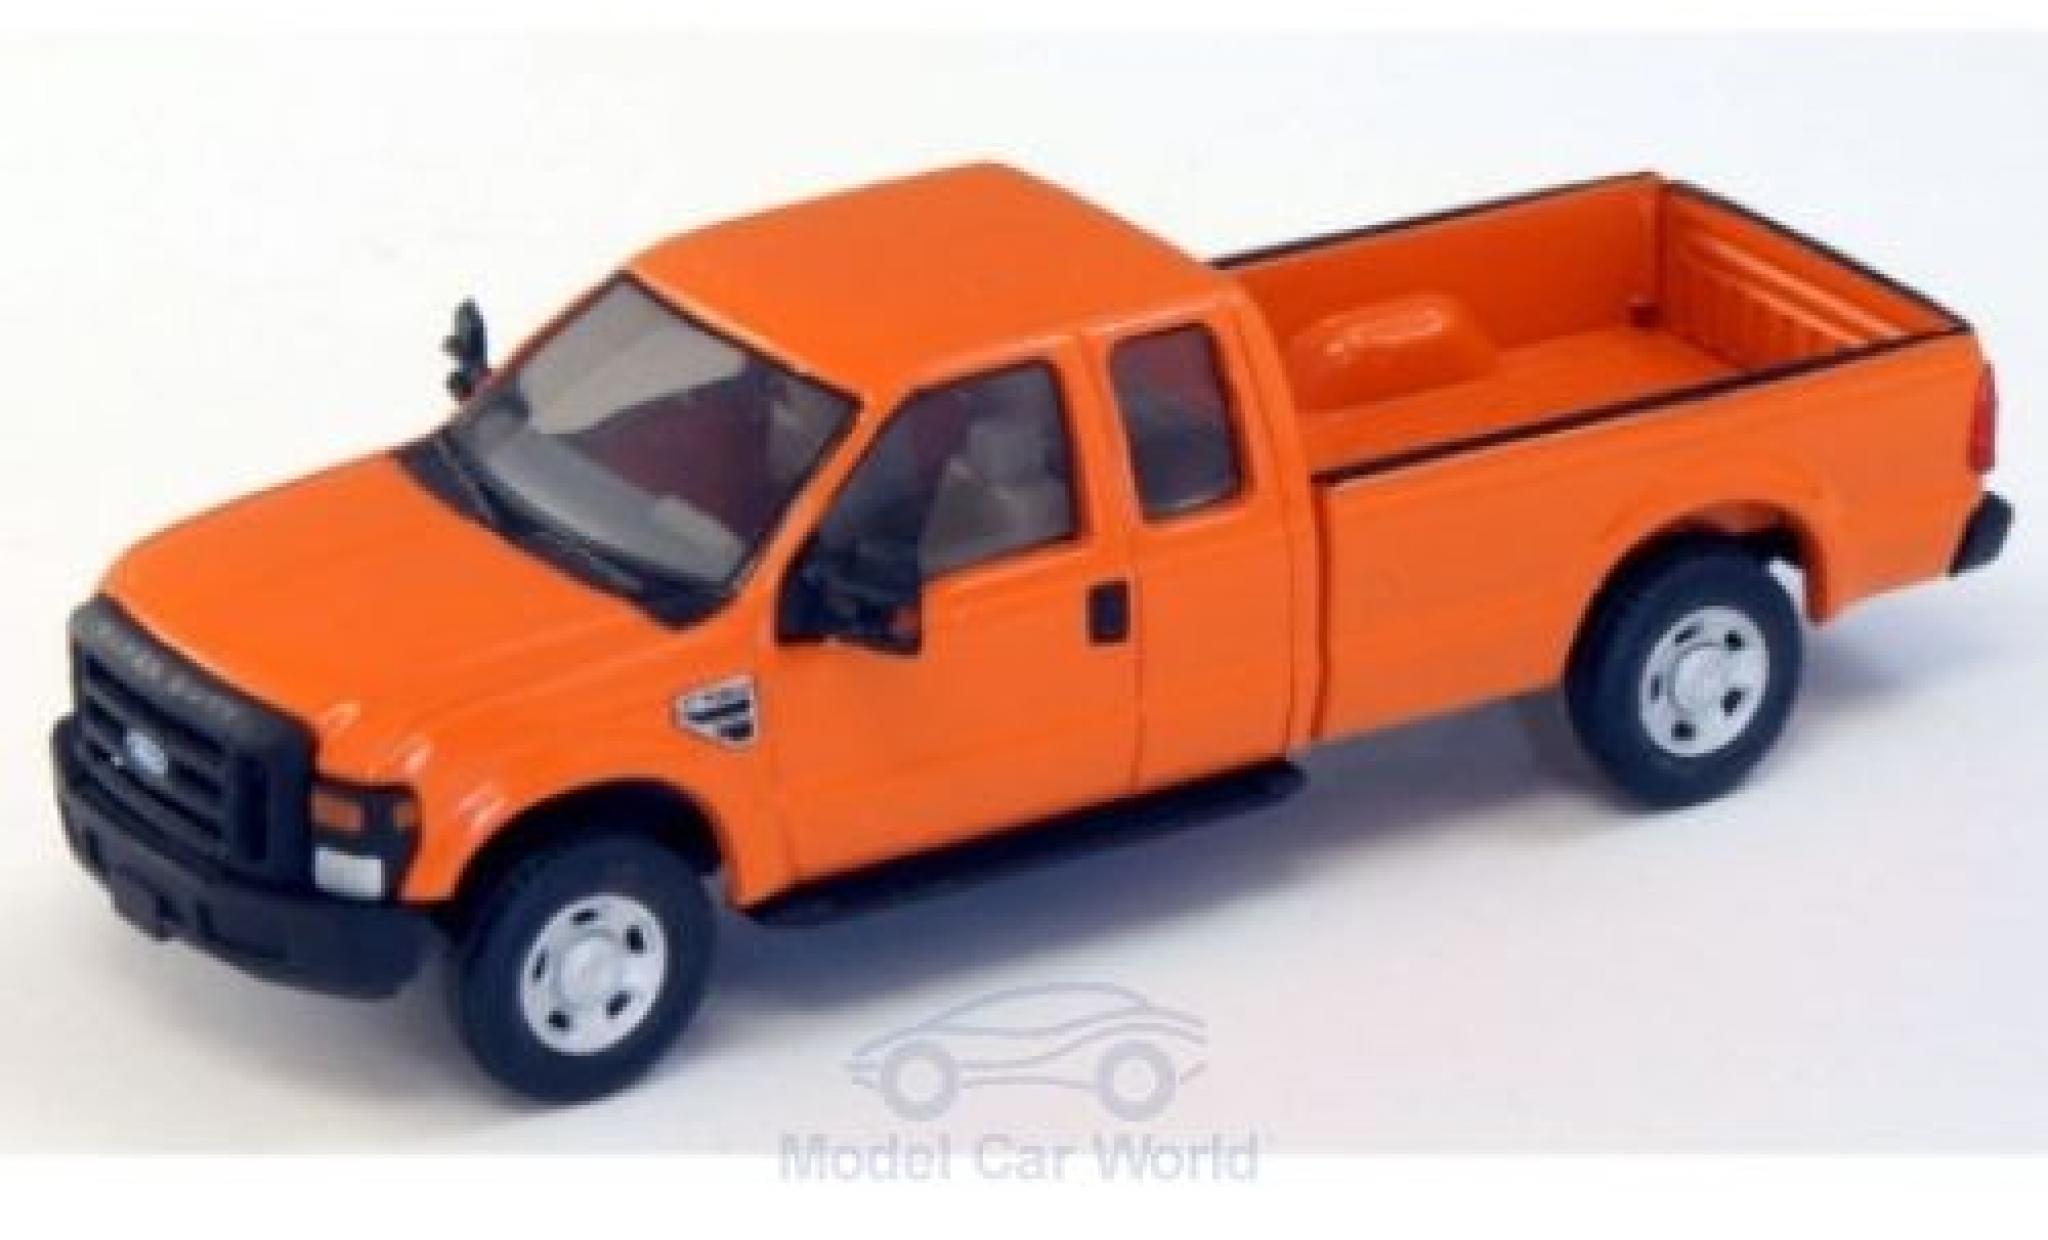 Ford F-250 1/87 River Point XLT Super Cab orange 2008